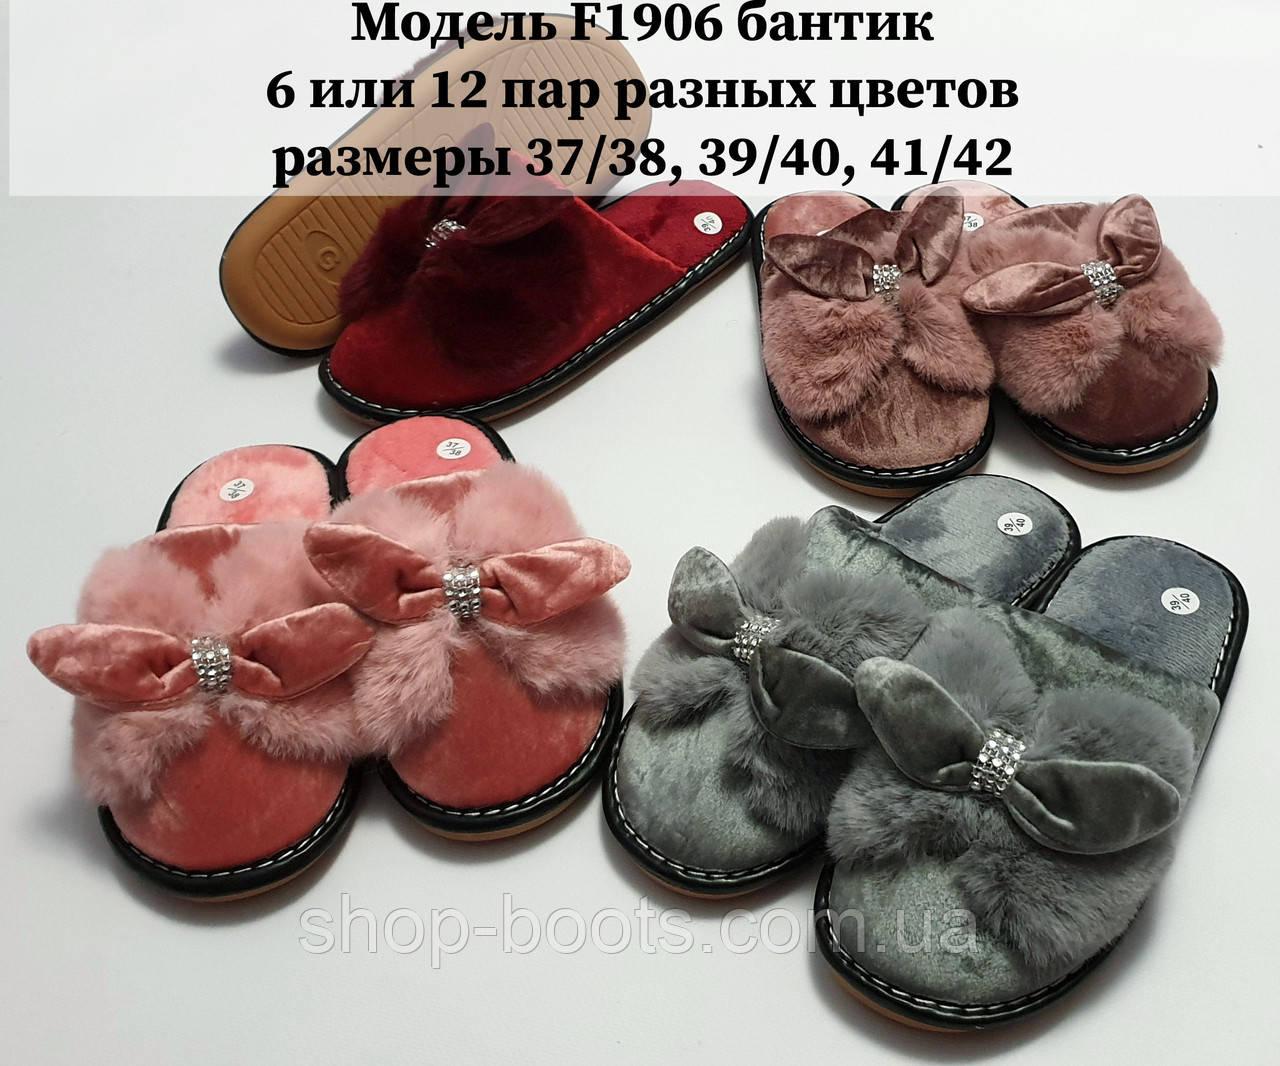 Женские тапочки оптом. 37-42рр. Модель тапочки F1906 бантик